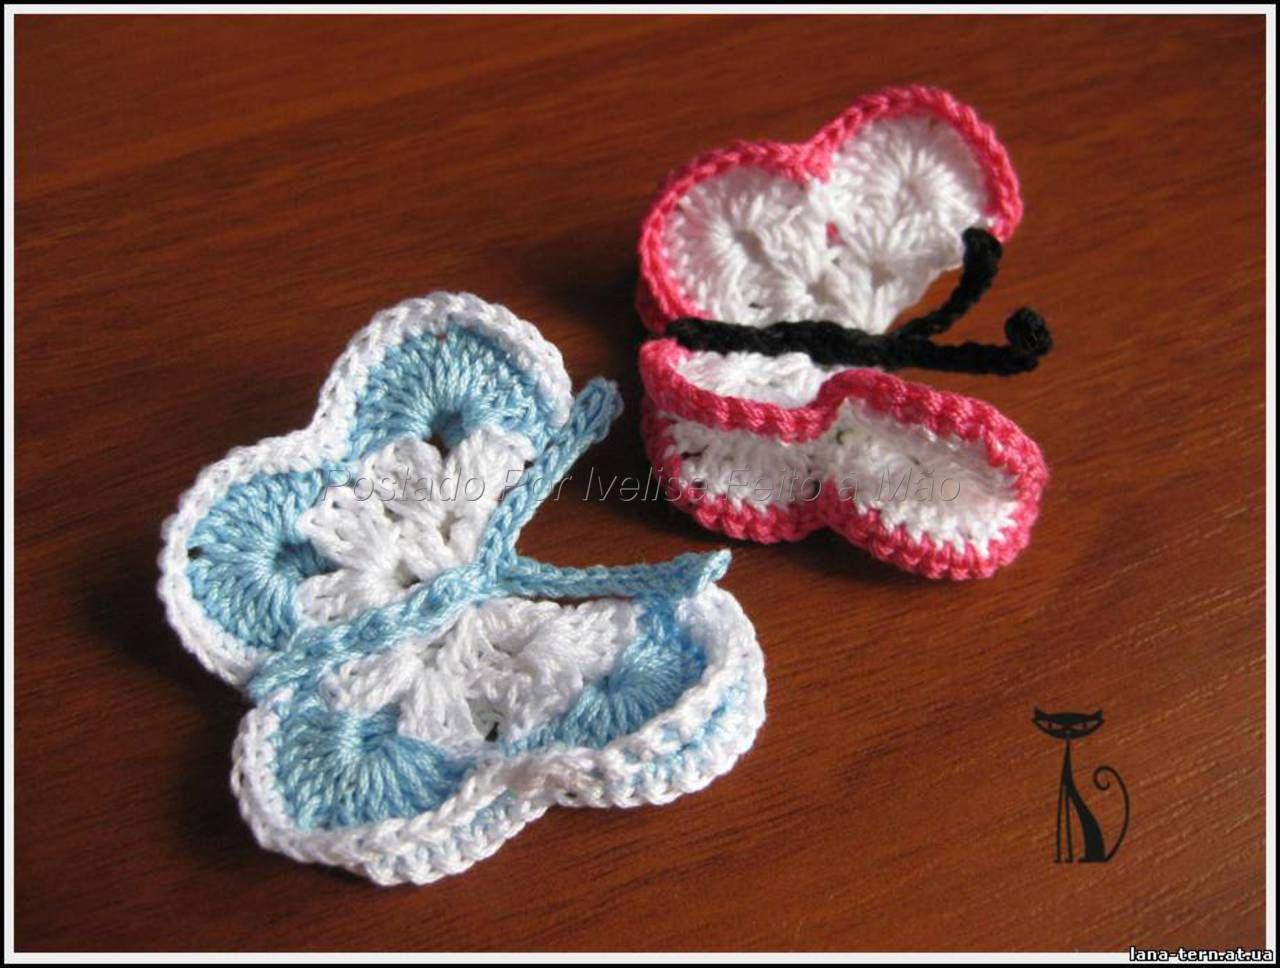 Ivelise Feito à Mão: Borboletinha Em Crochê!Pap..... ~ Butterfly pictorial